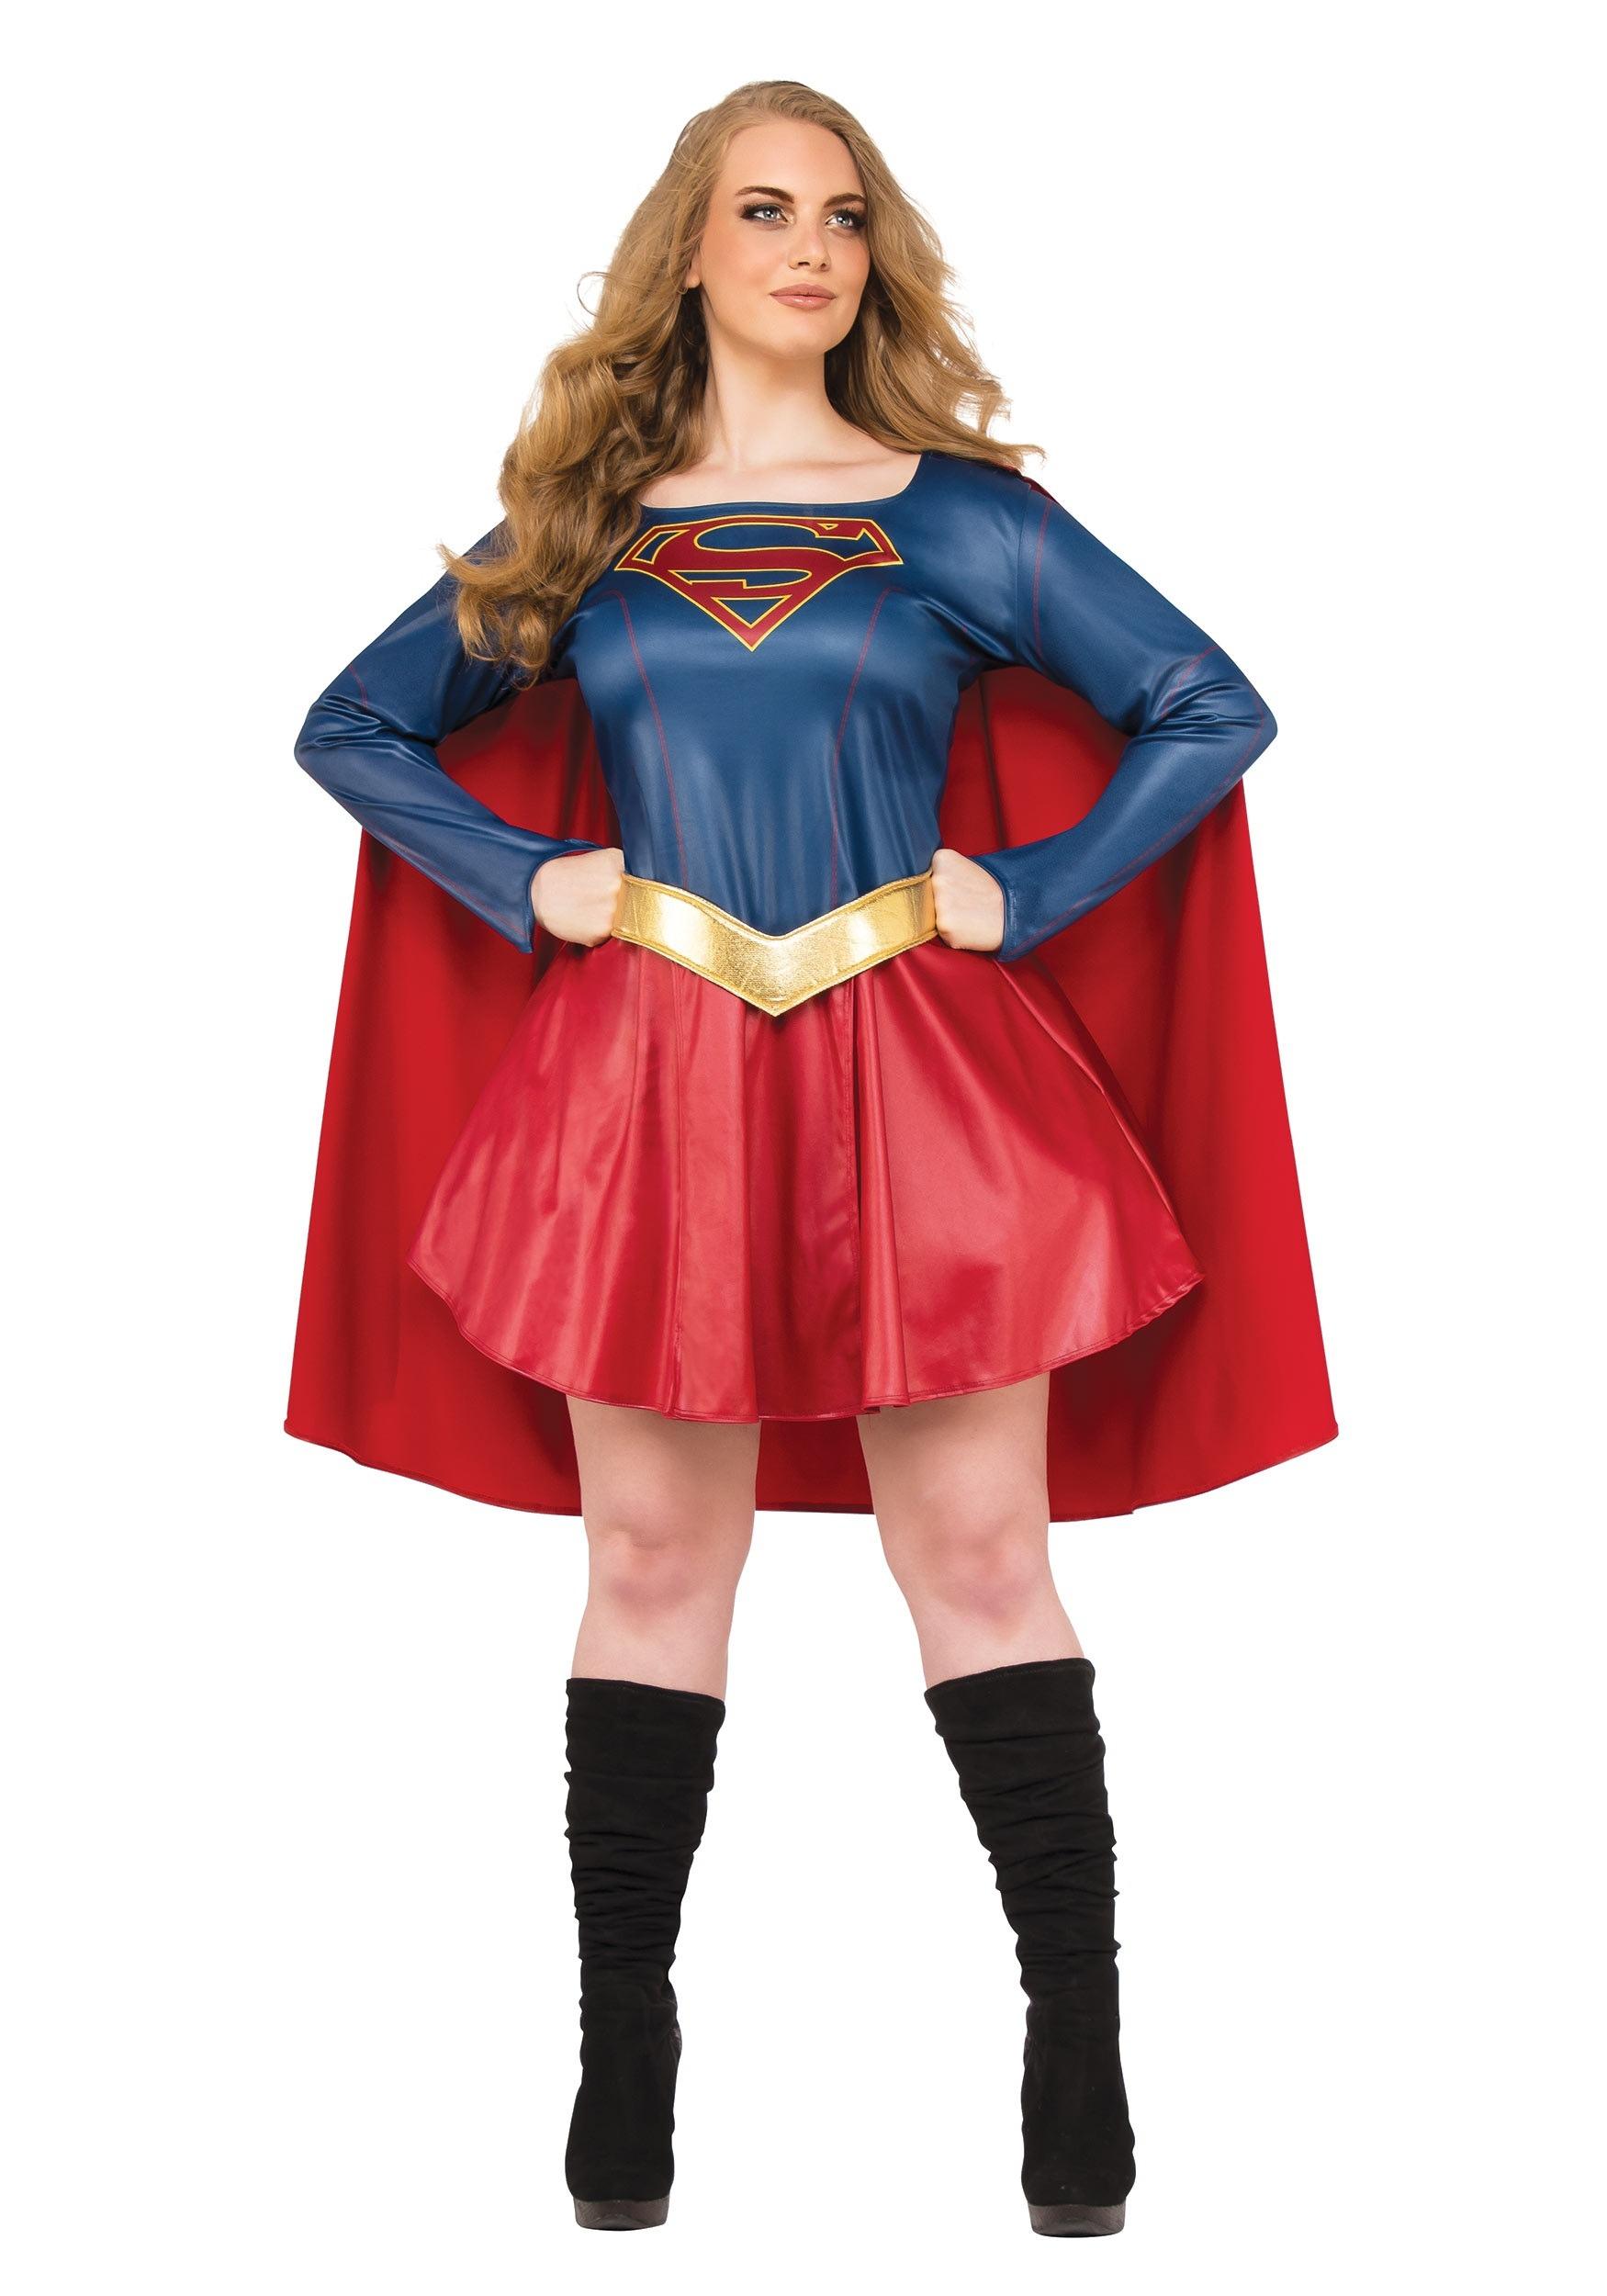 Plus Size Supergirl Tv Costume For Women-7546